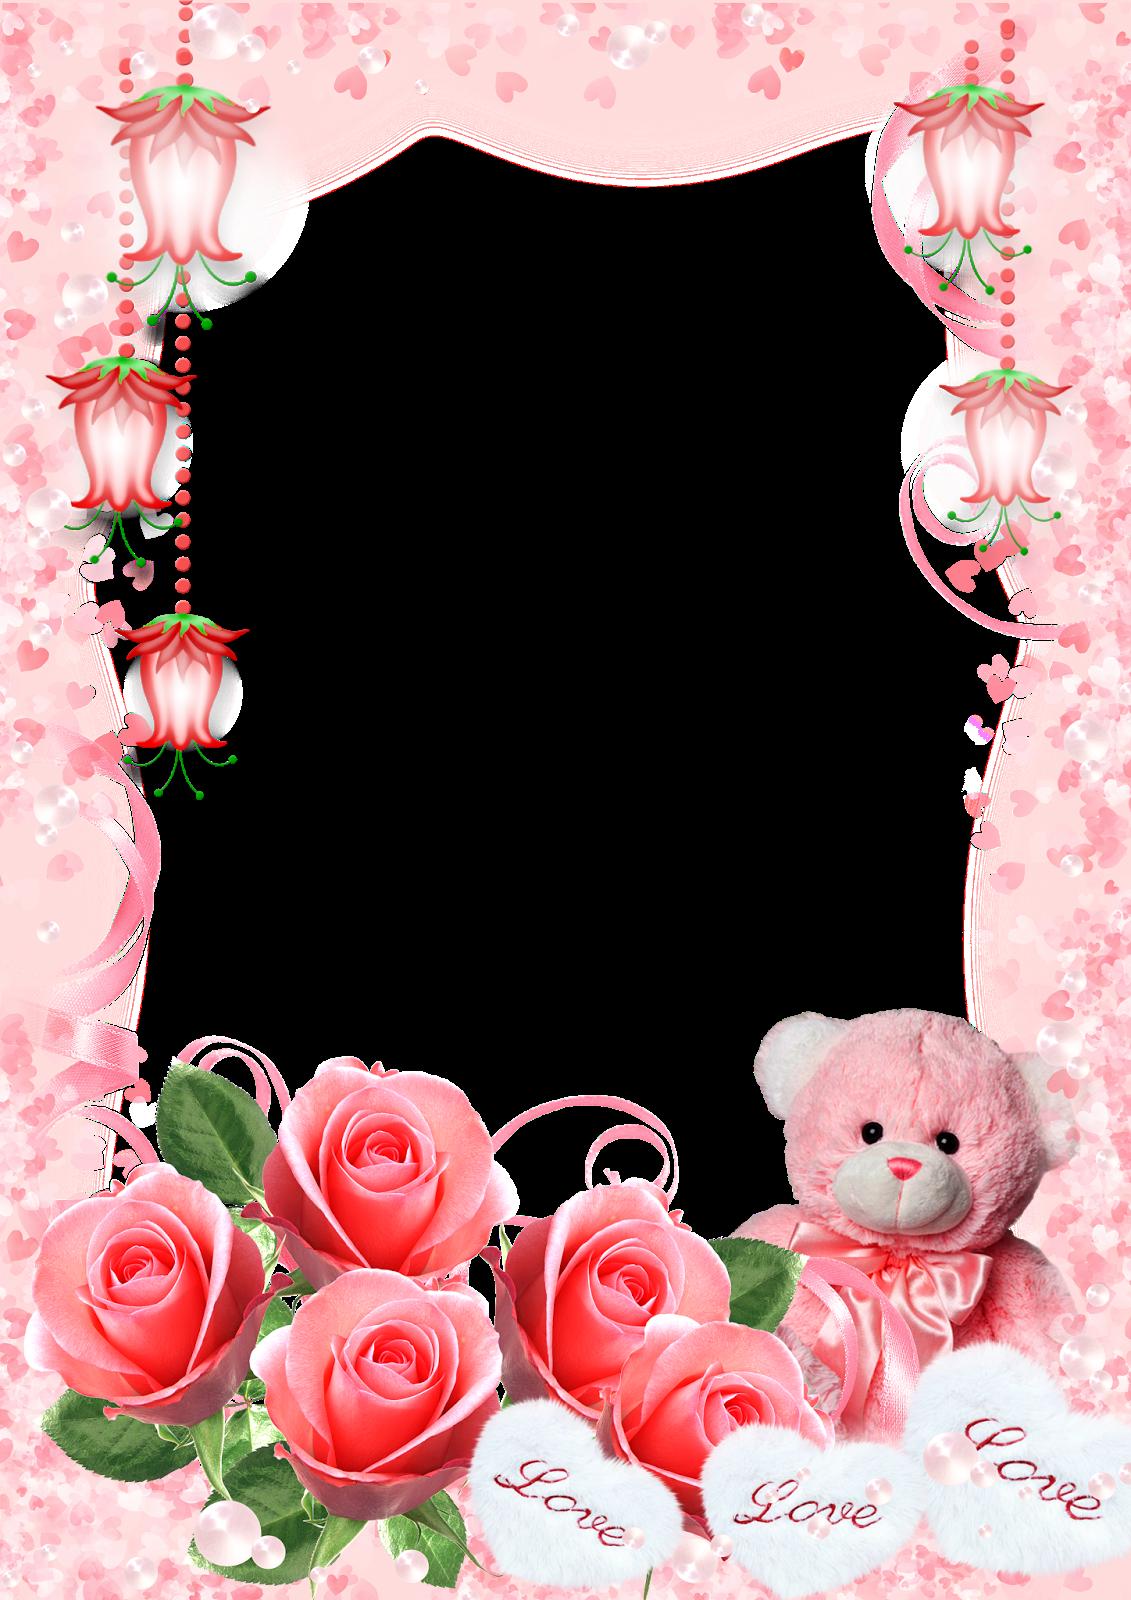 Cosas Mias Marcos Para San Valentin Png Valentines Frame Floral